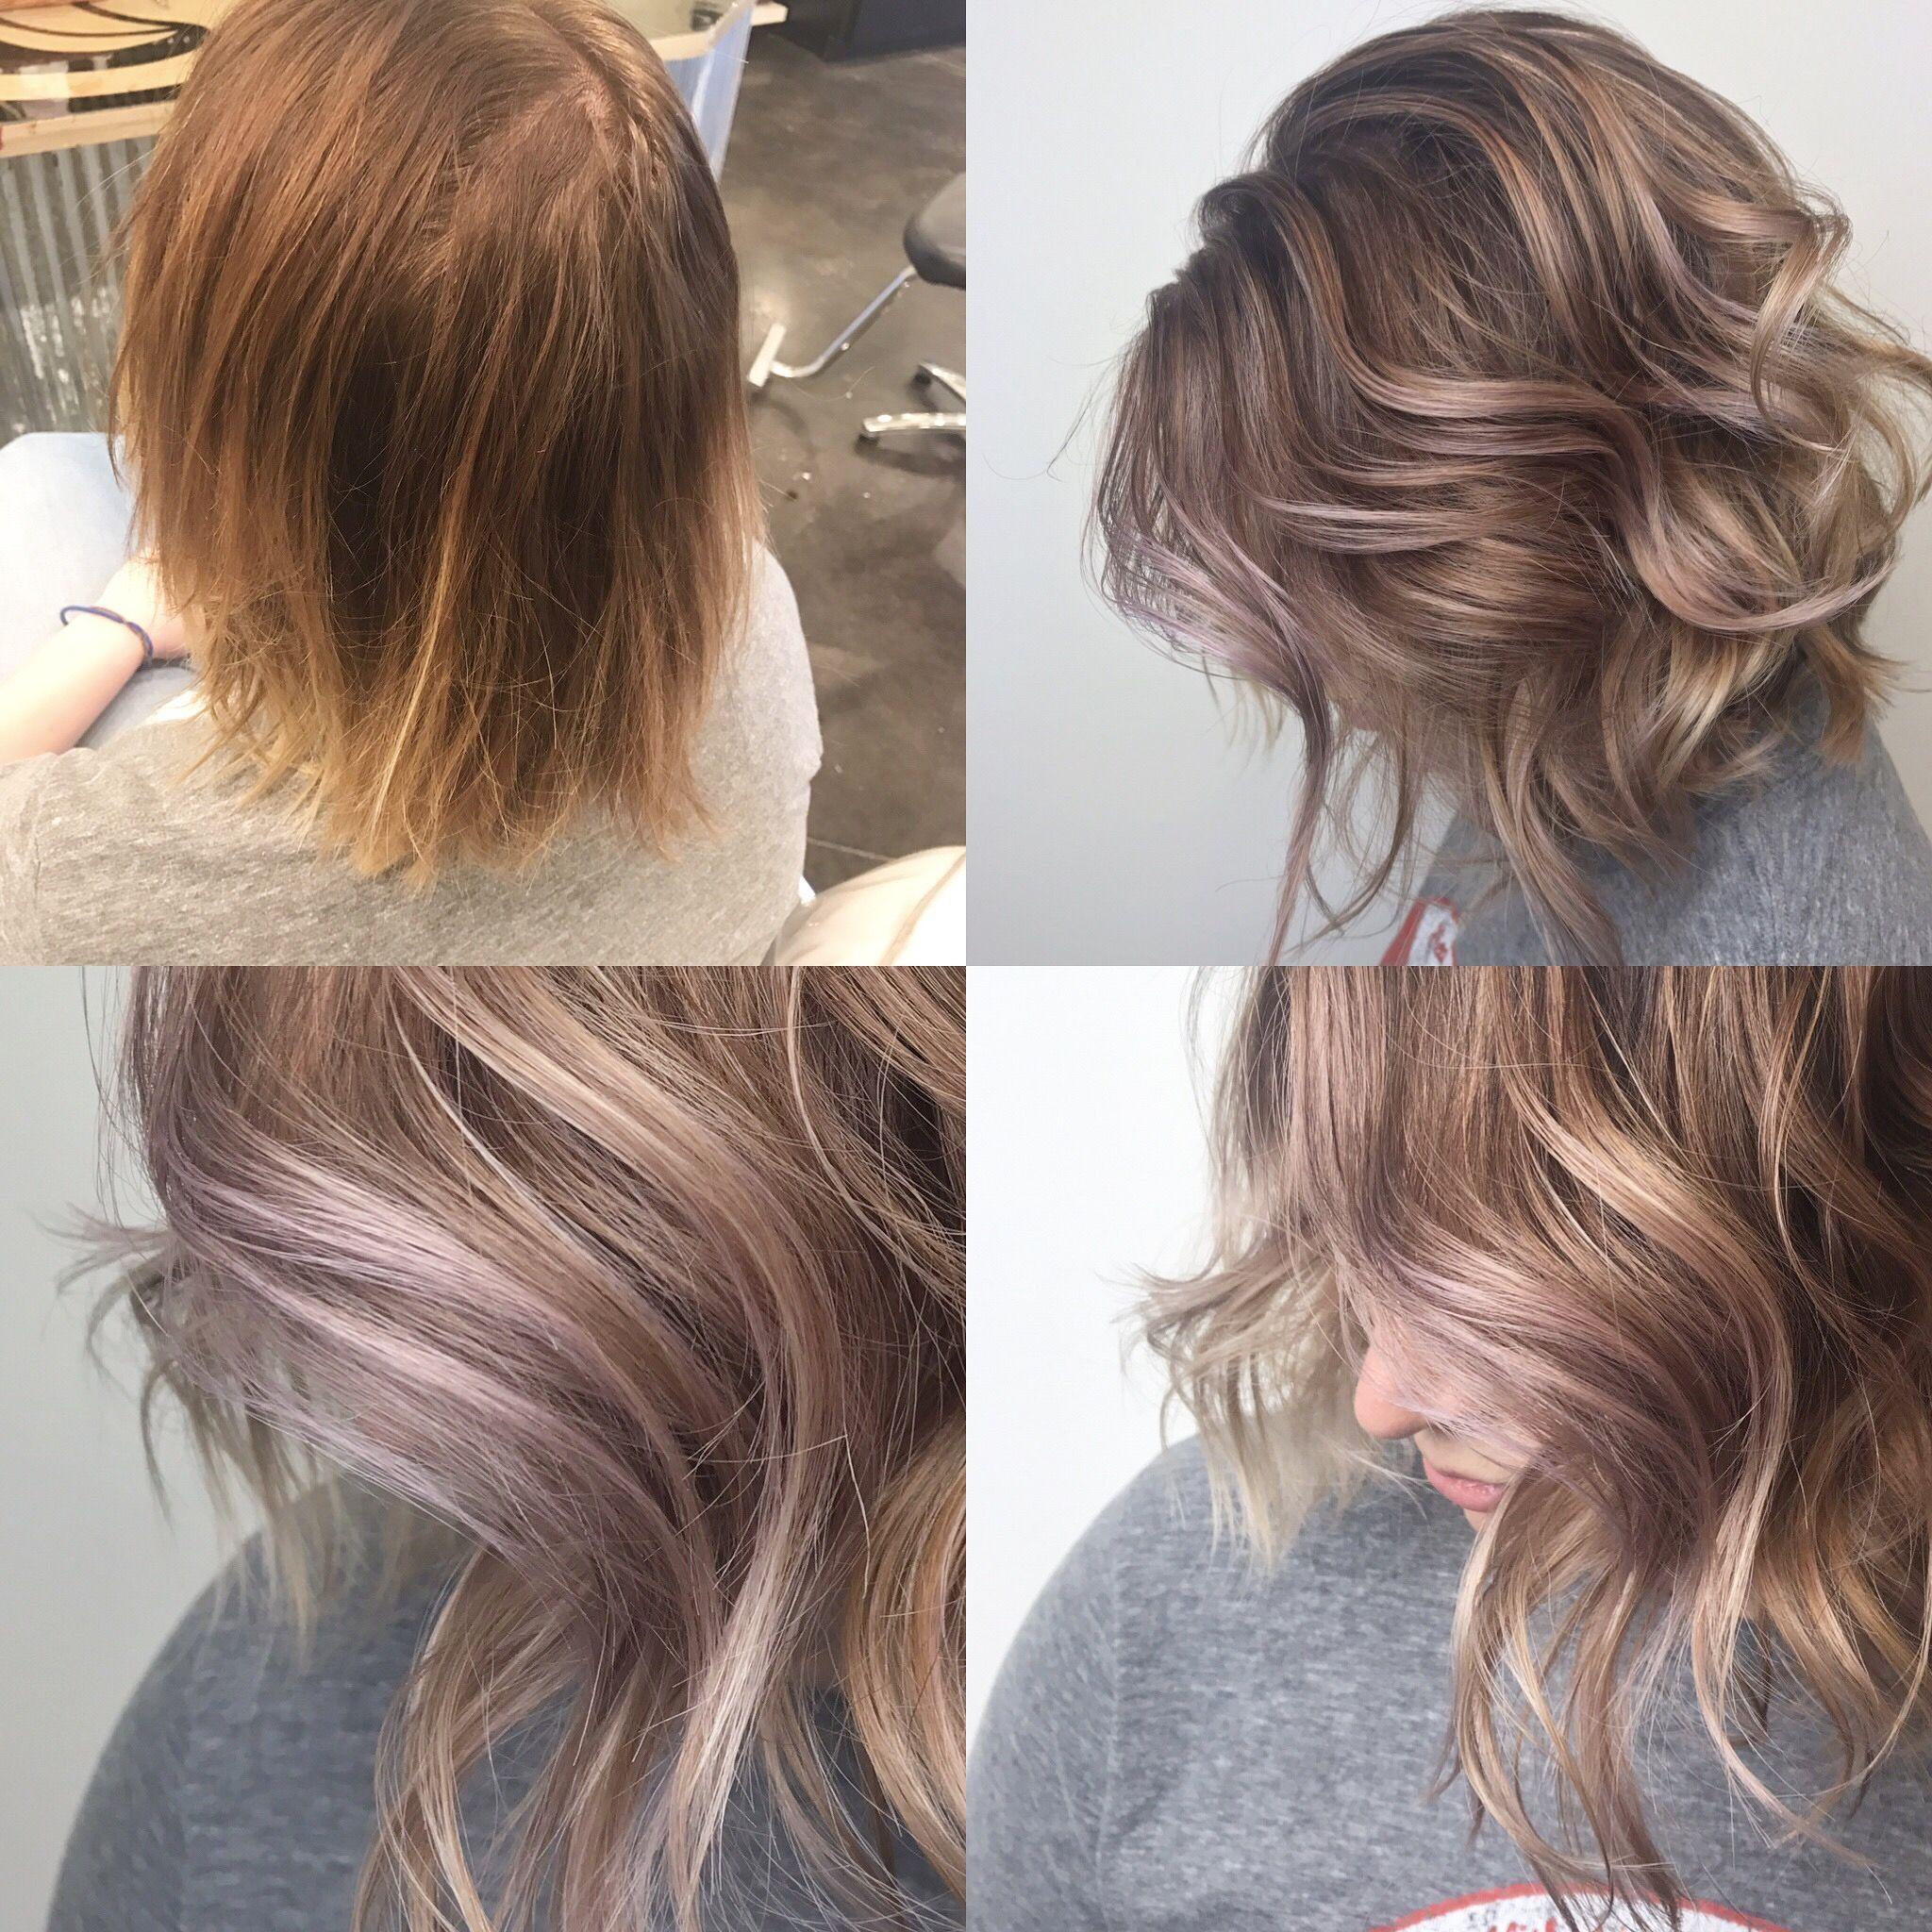 Pin On Hair By Natasha Fehlhaber